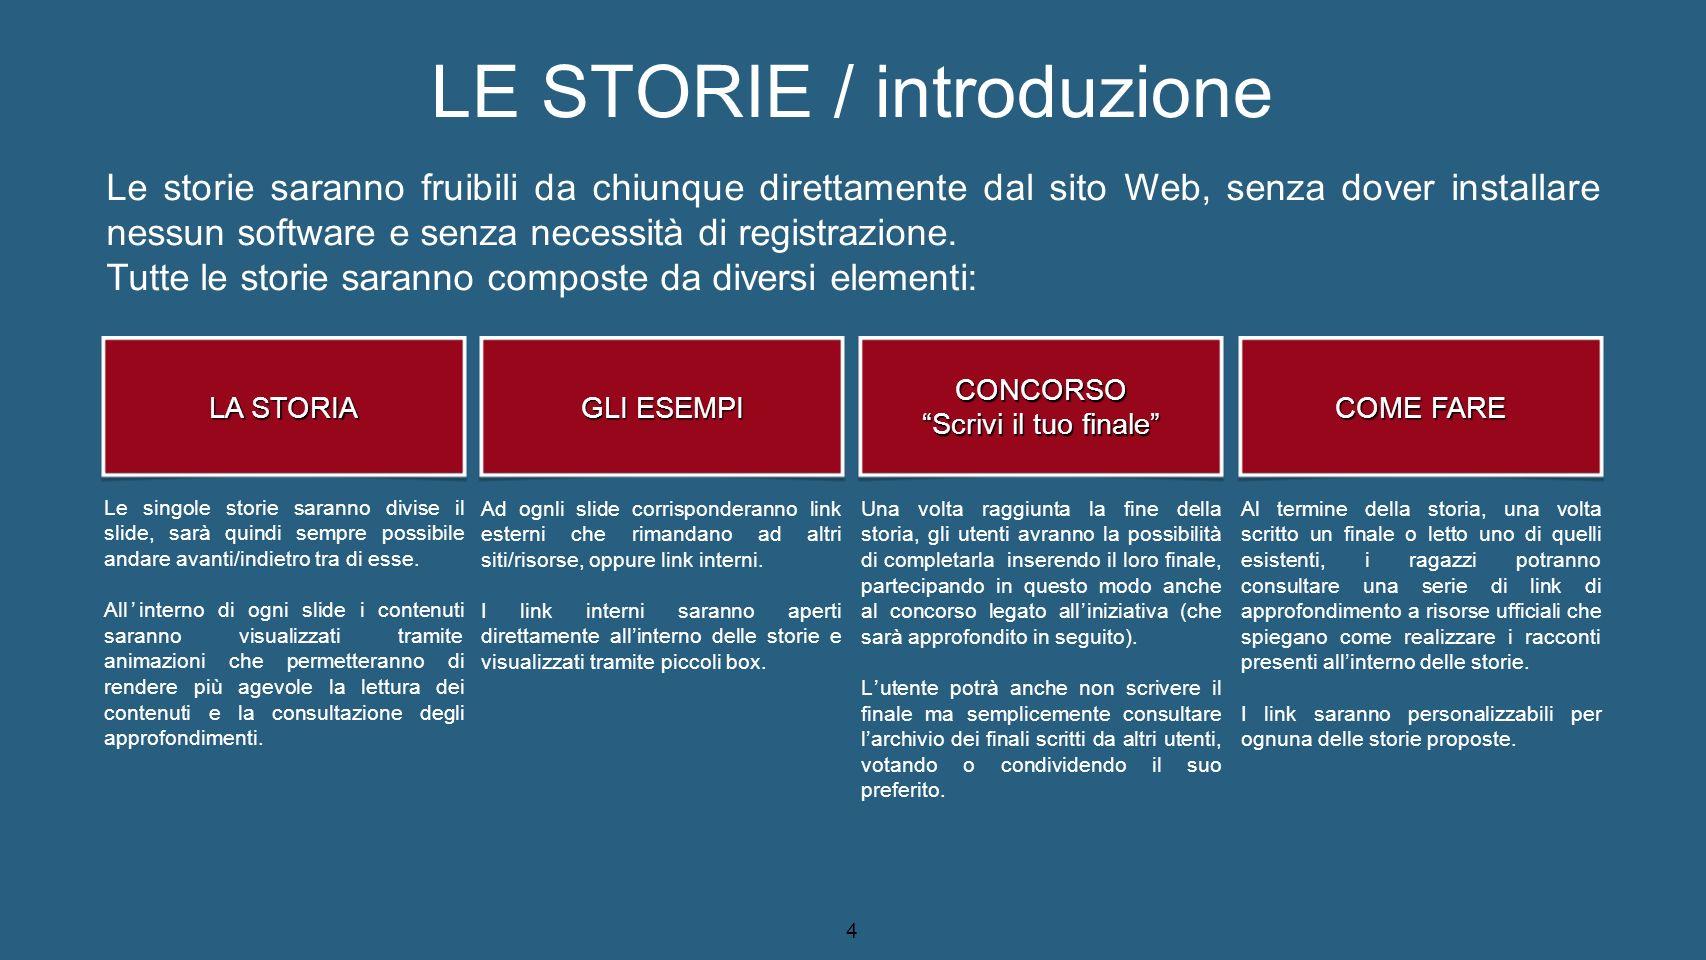 LE STORIE / introduzione